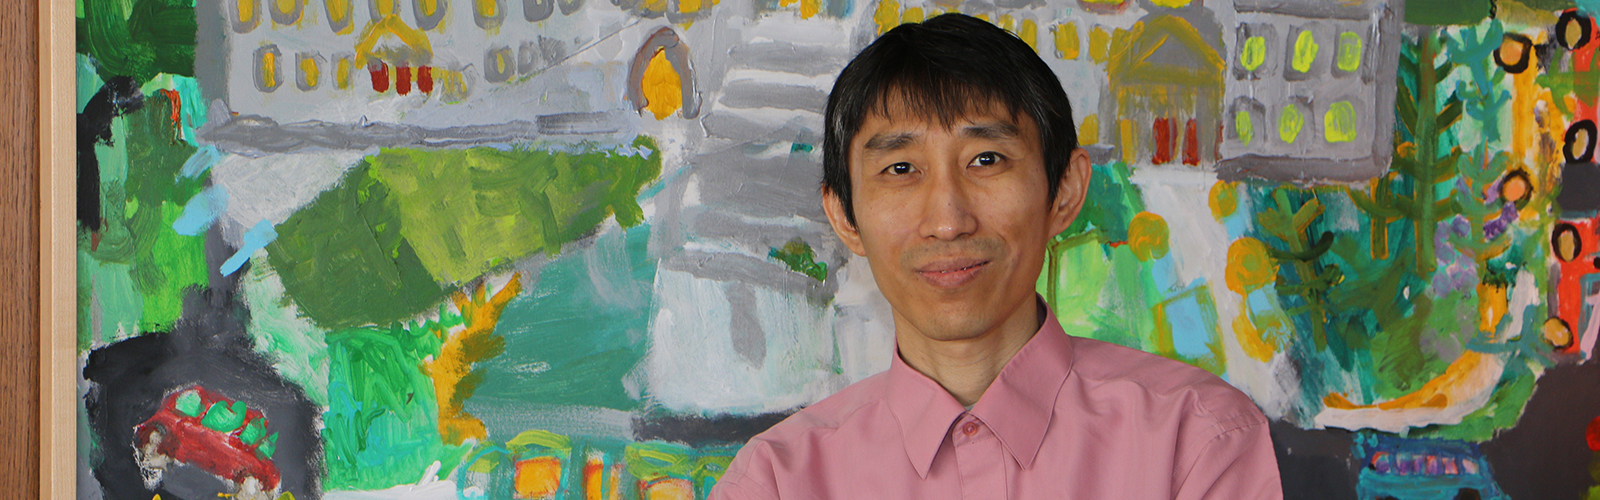 New Waisman Center director Qiang Chang